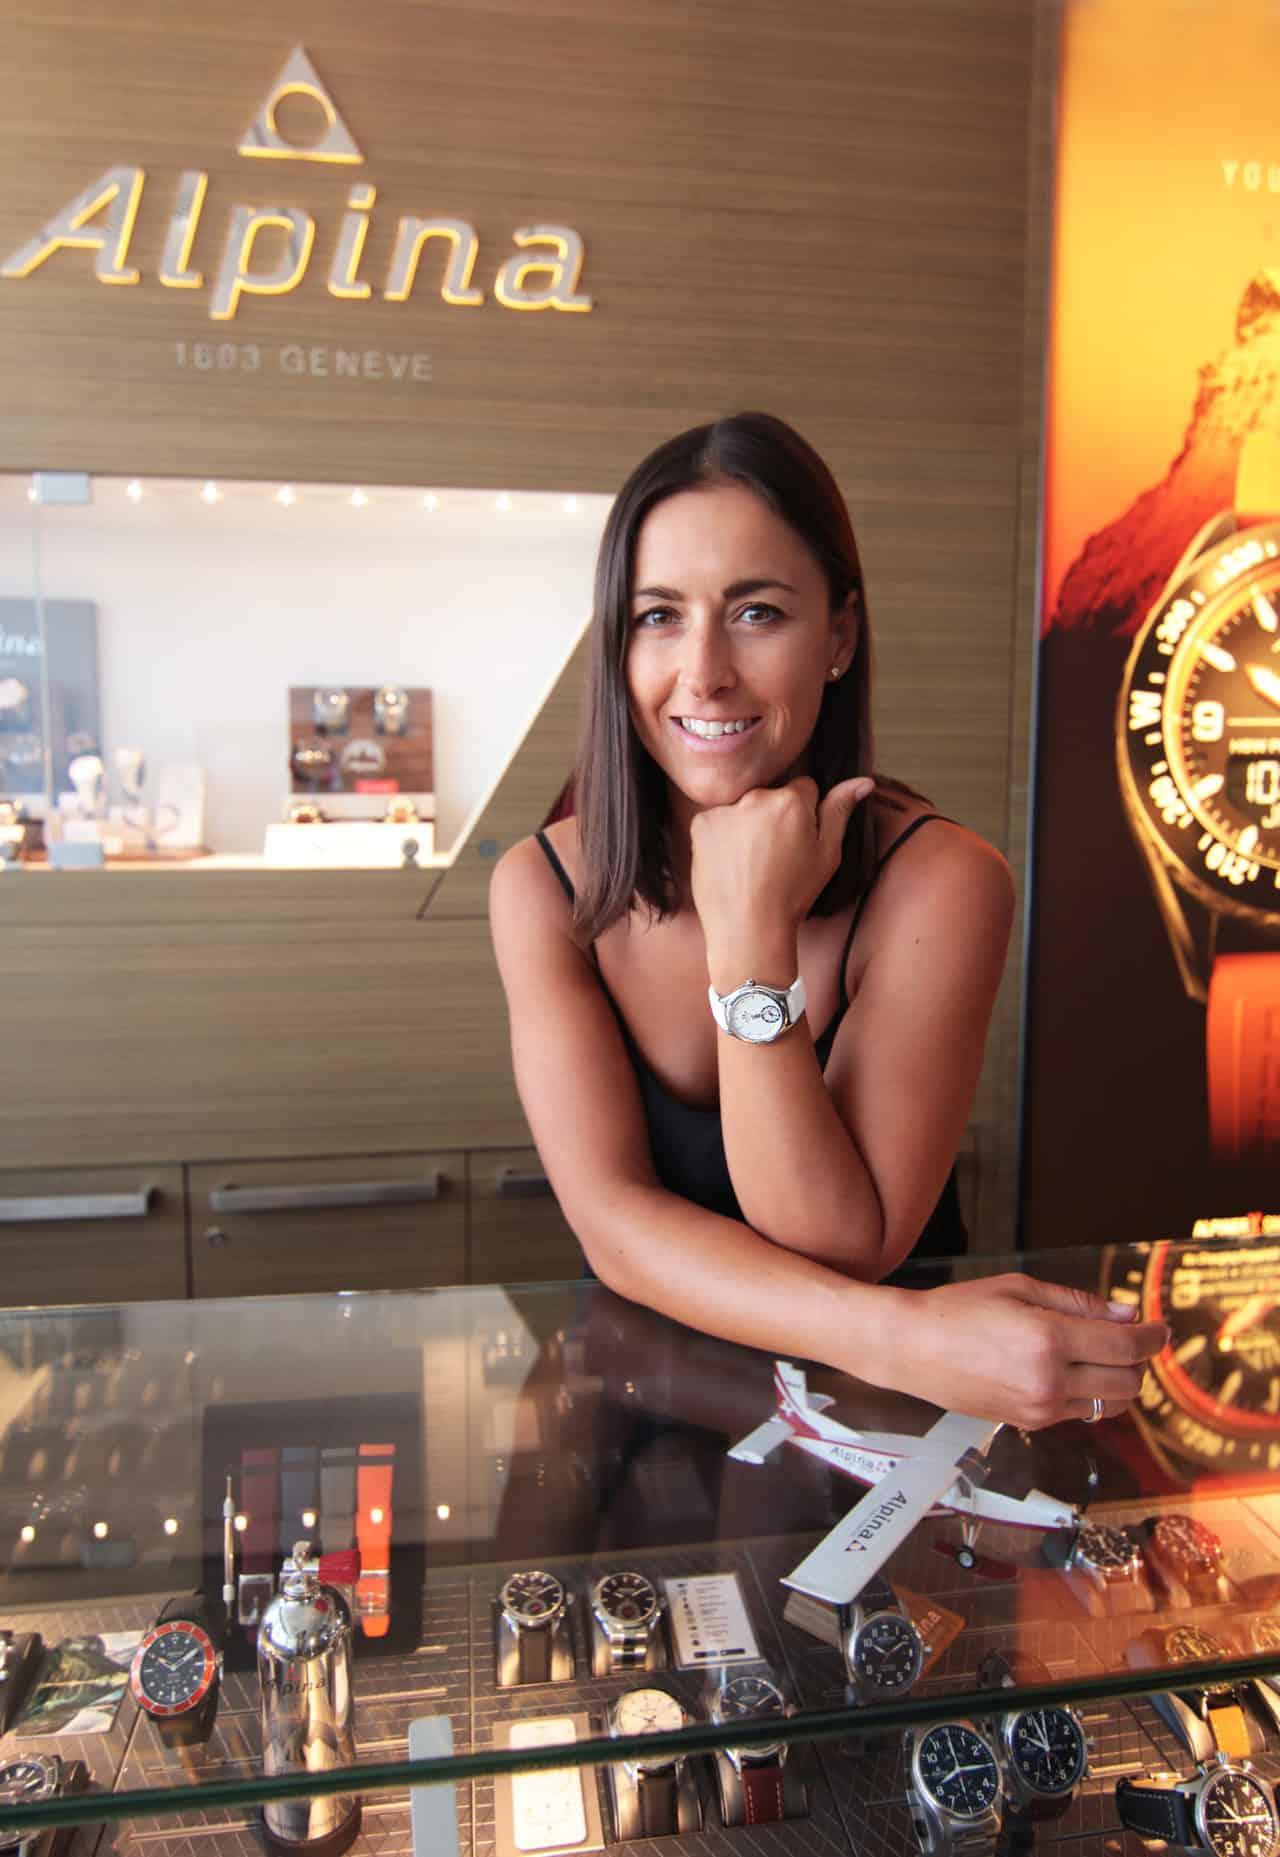 Italian Fis World Cup Alpine Skier Irene Curtoni – Alpina Watches Brand Ambassador